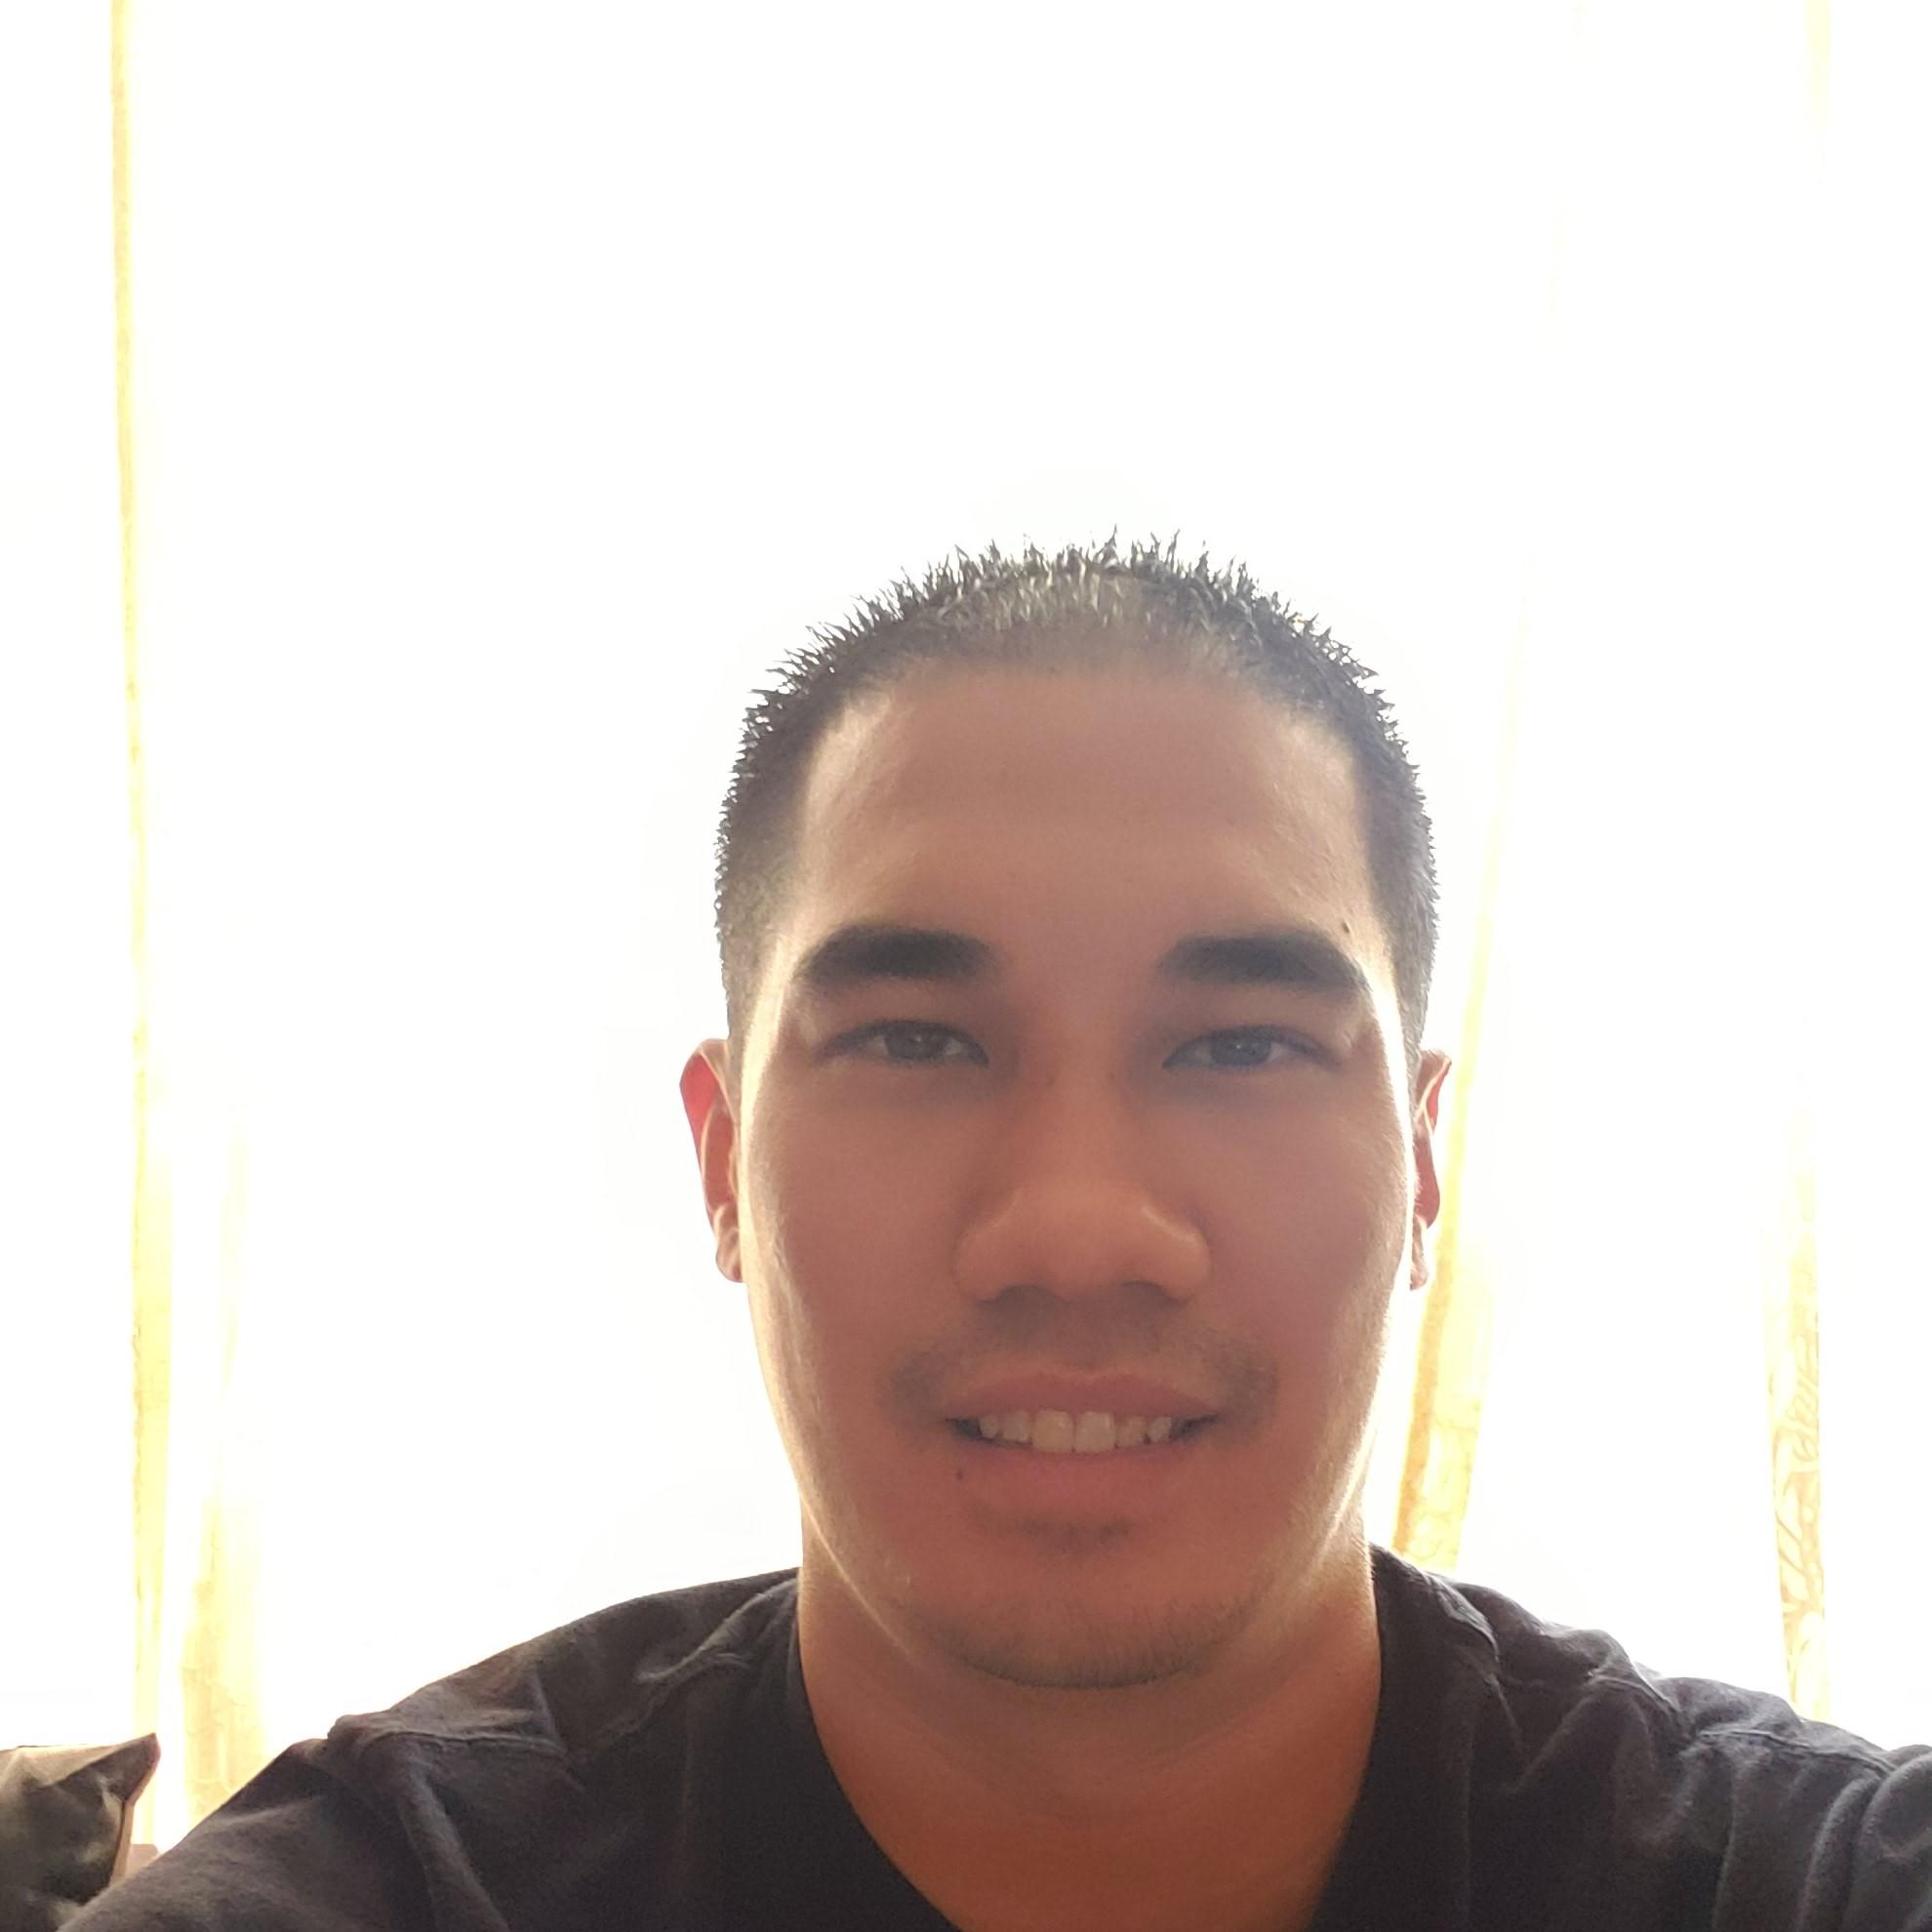 http://catch-app.oss-us-east-1.aliyuncs.com/image/1626922462738-6d6ac94c-a8d1-4b6b-ae28-59d3cfa1ce3f.jpg